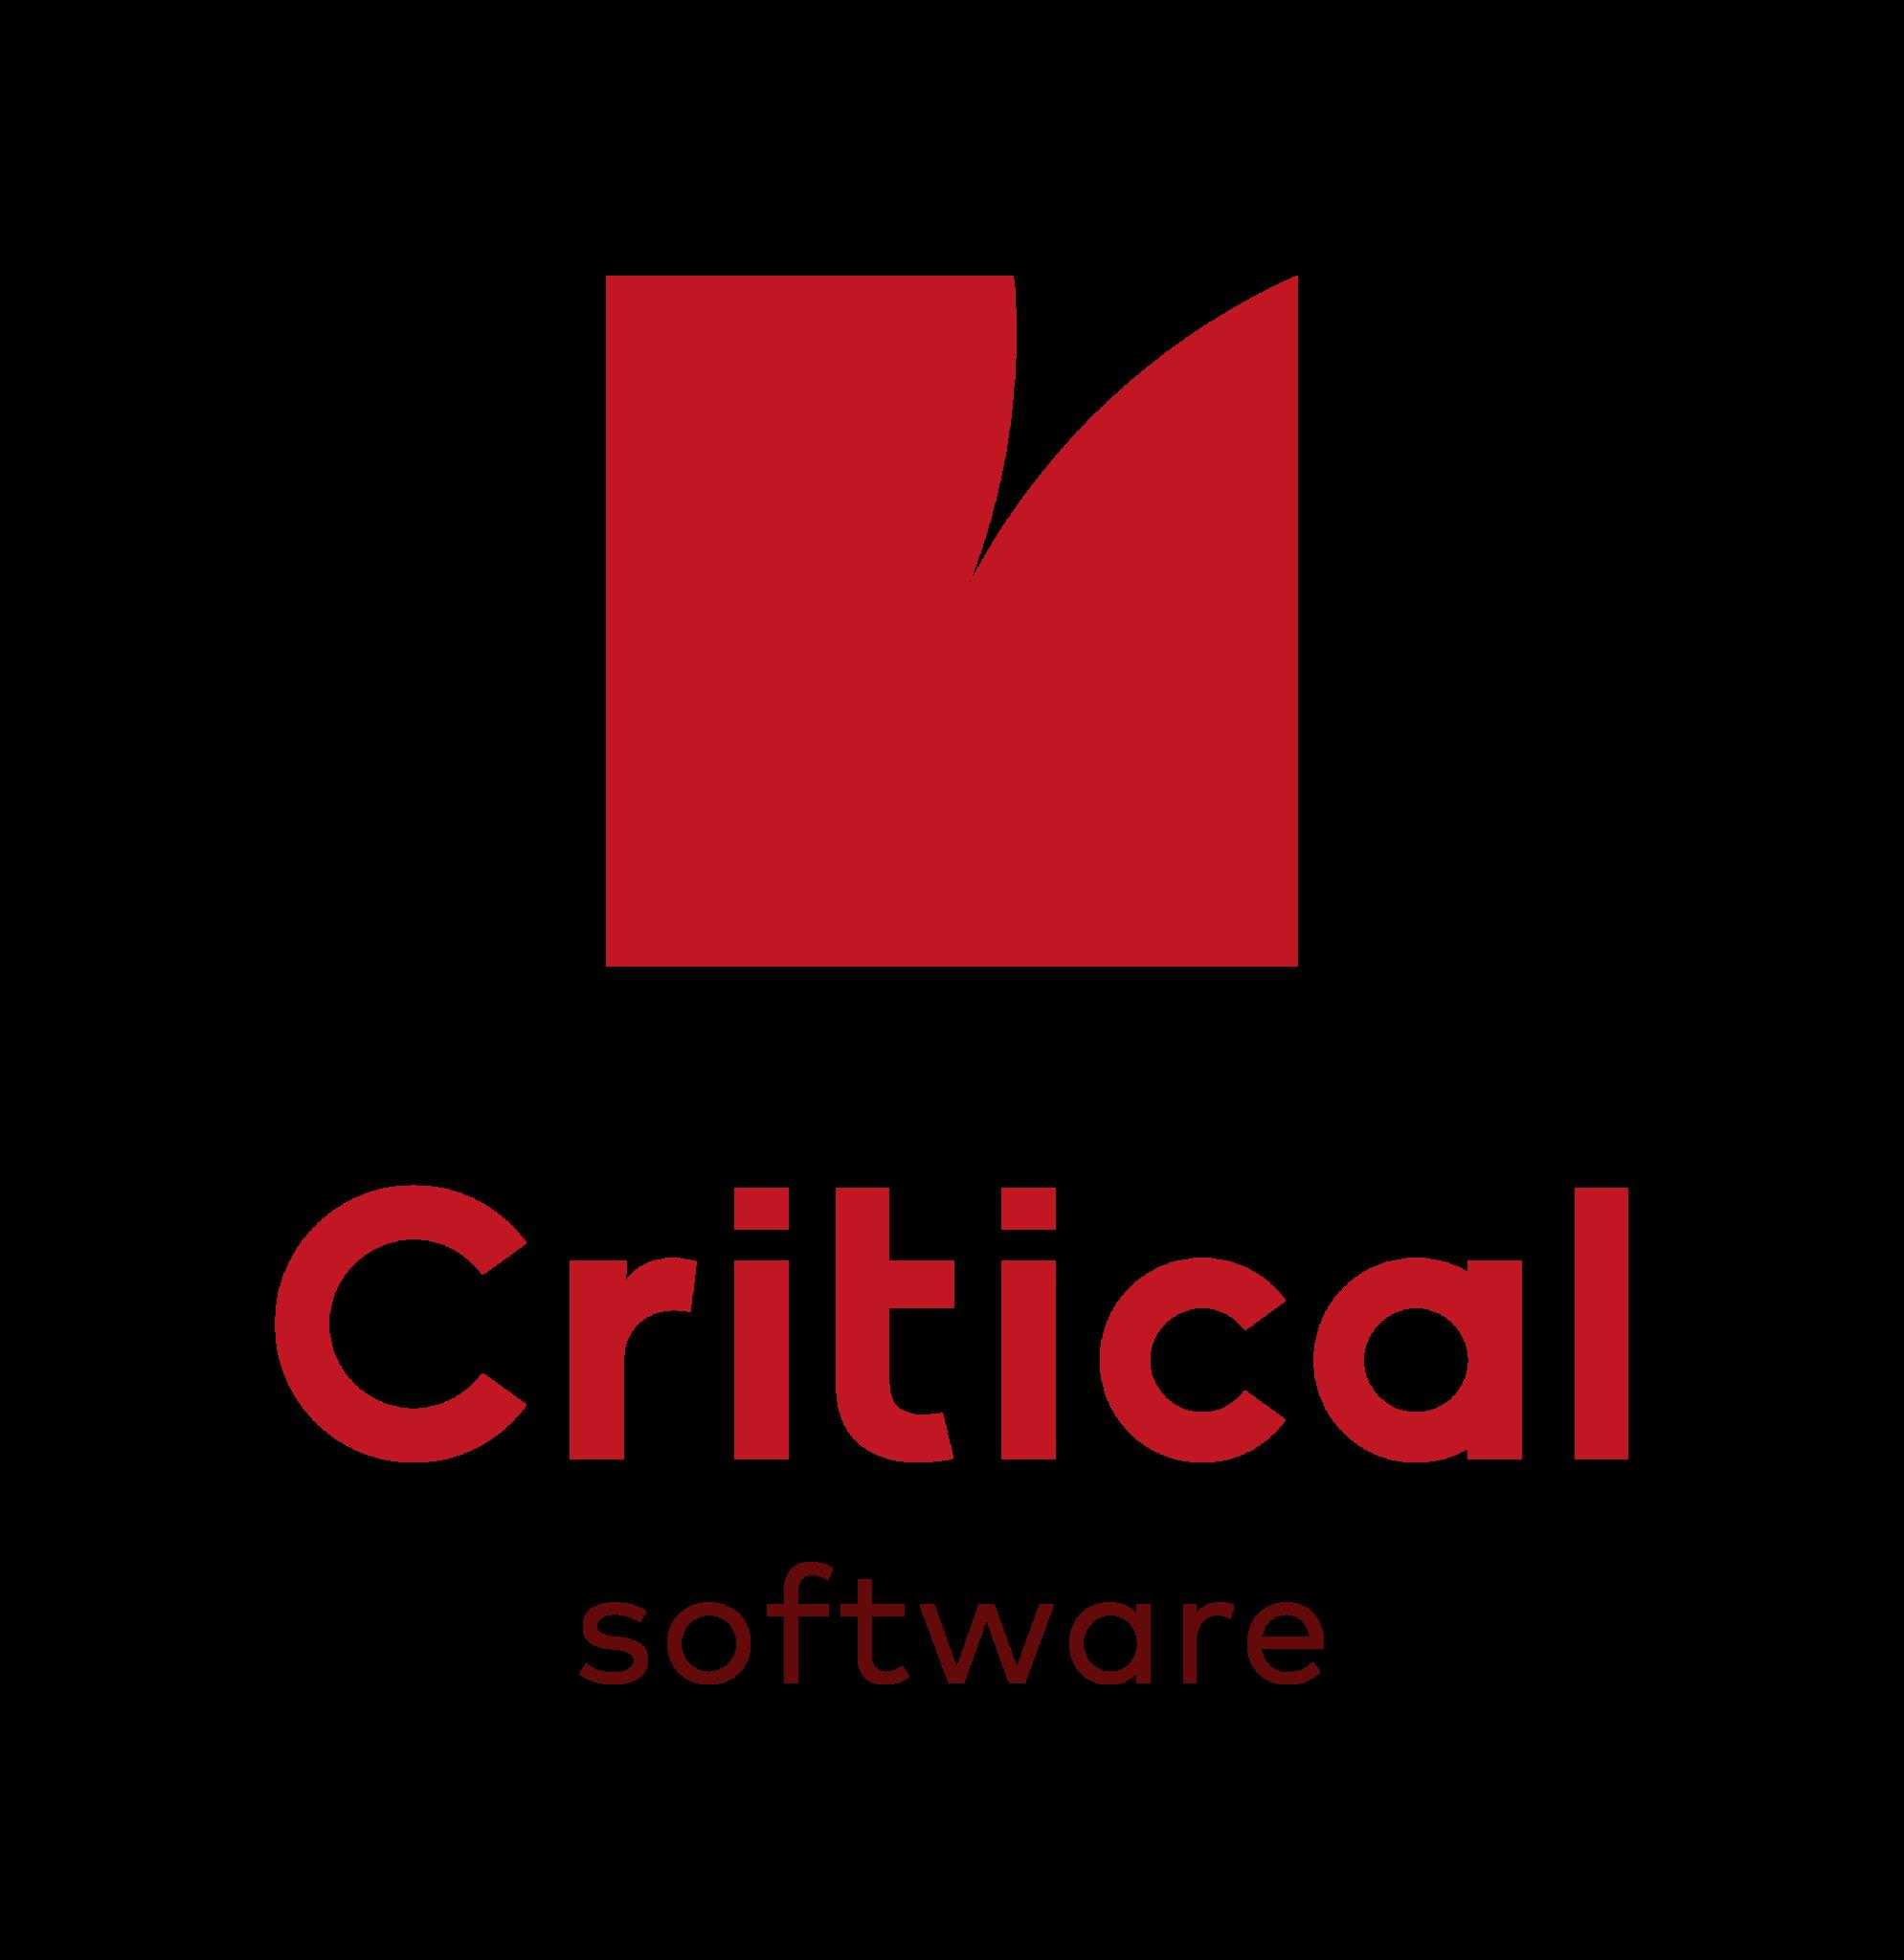 logo_VERTICAL_CRITICALSoftware_Vertical Version